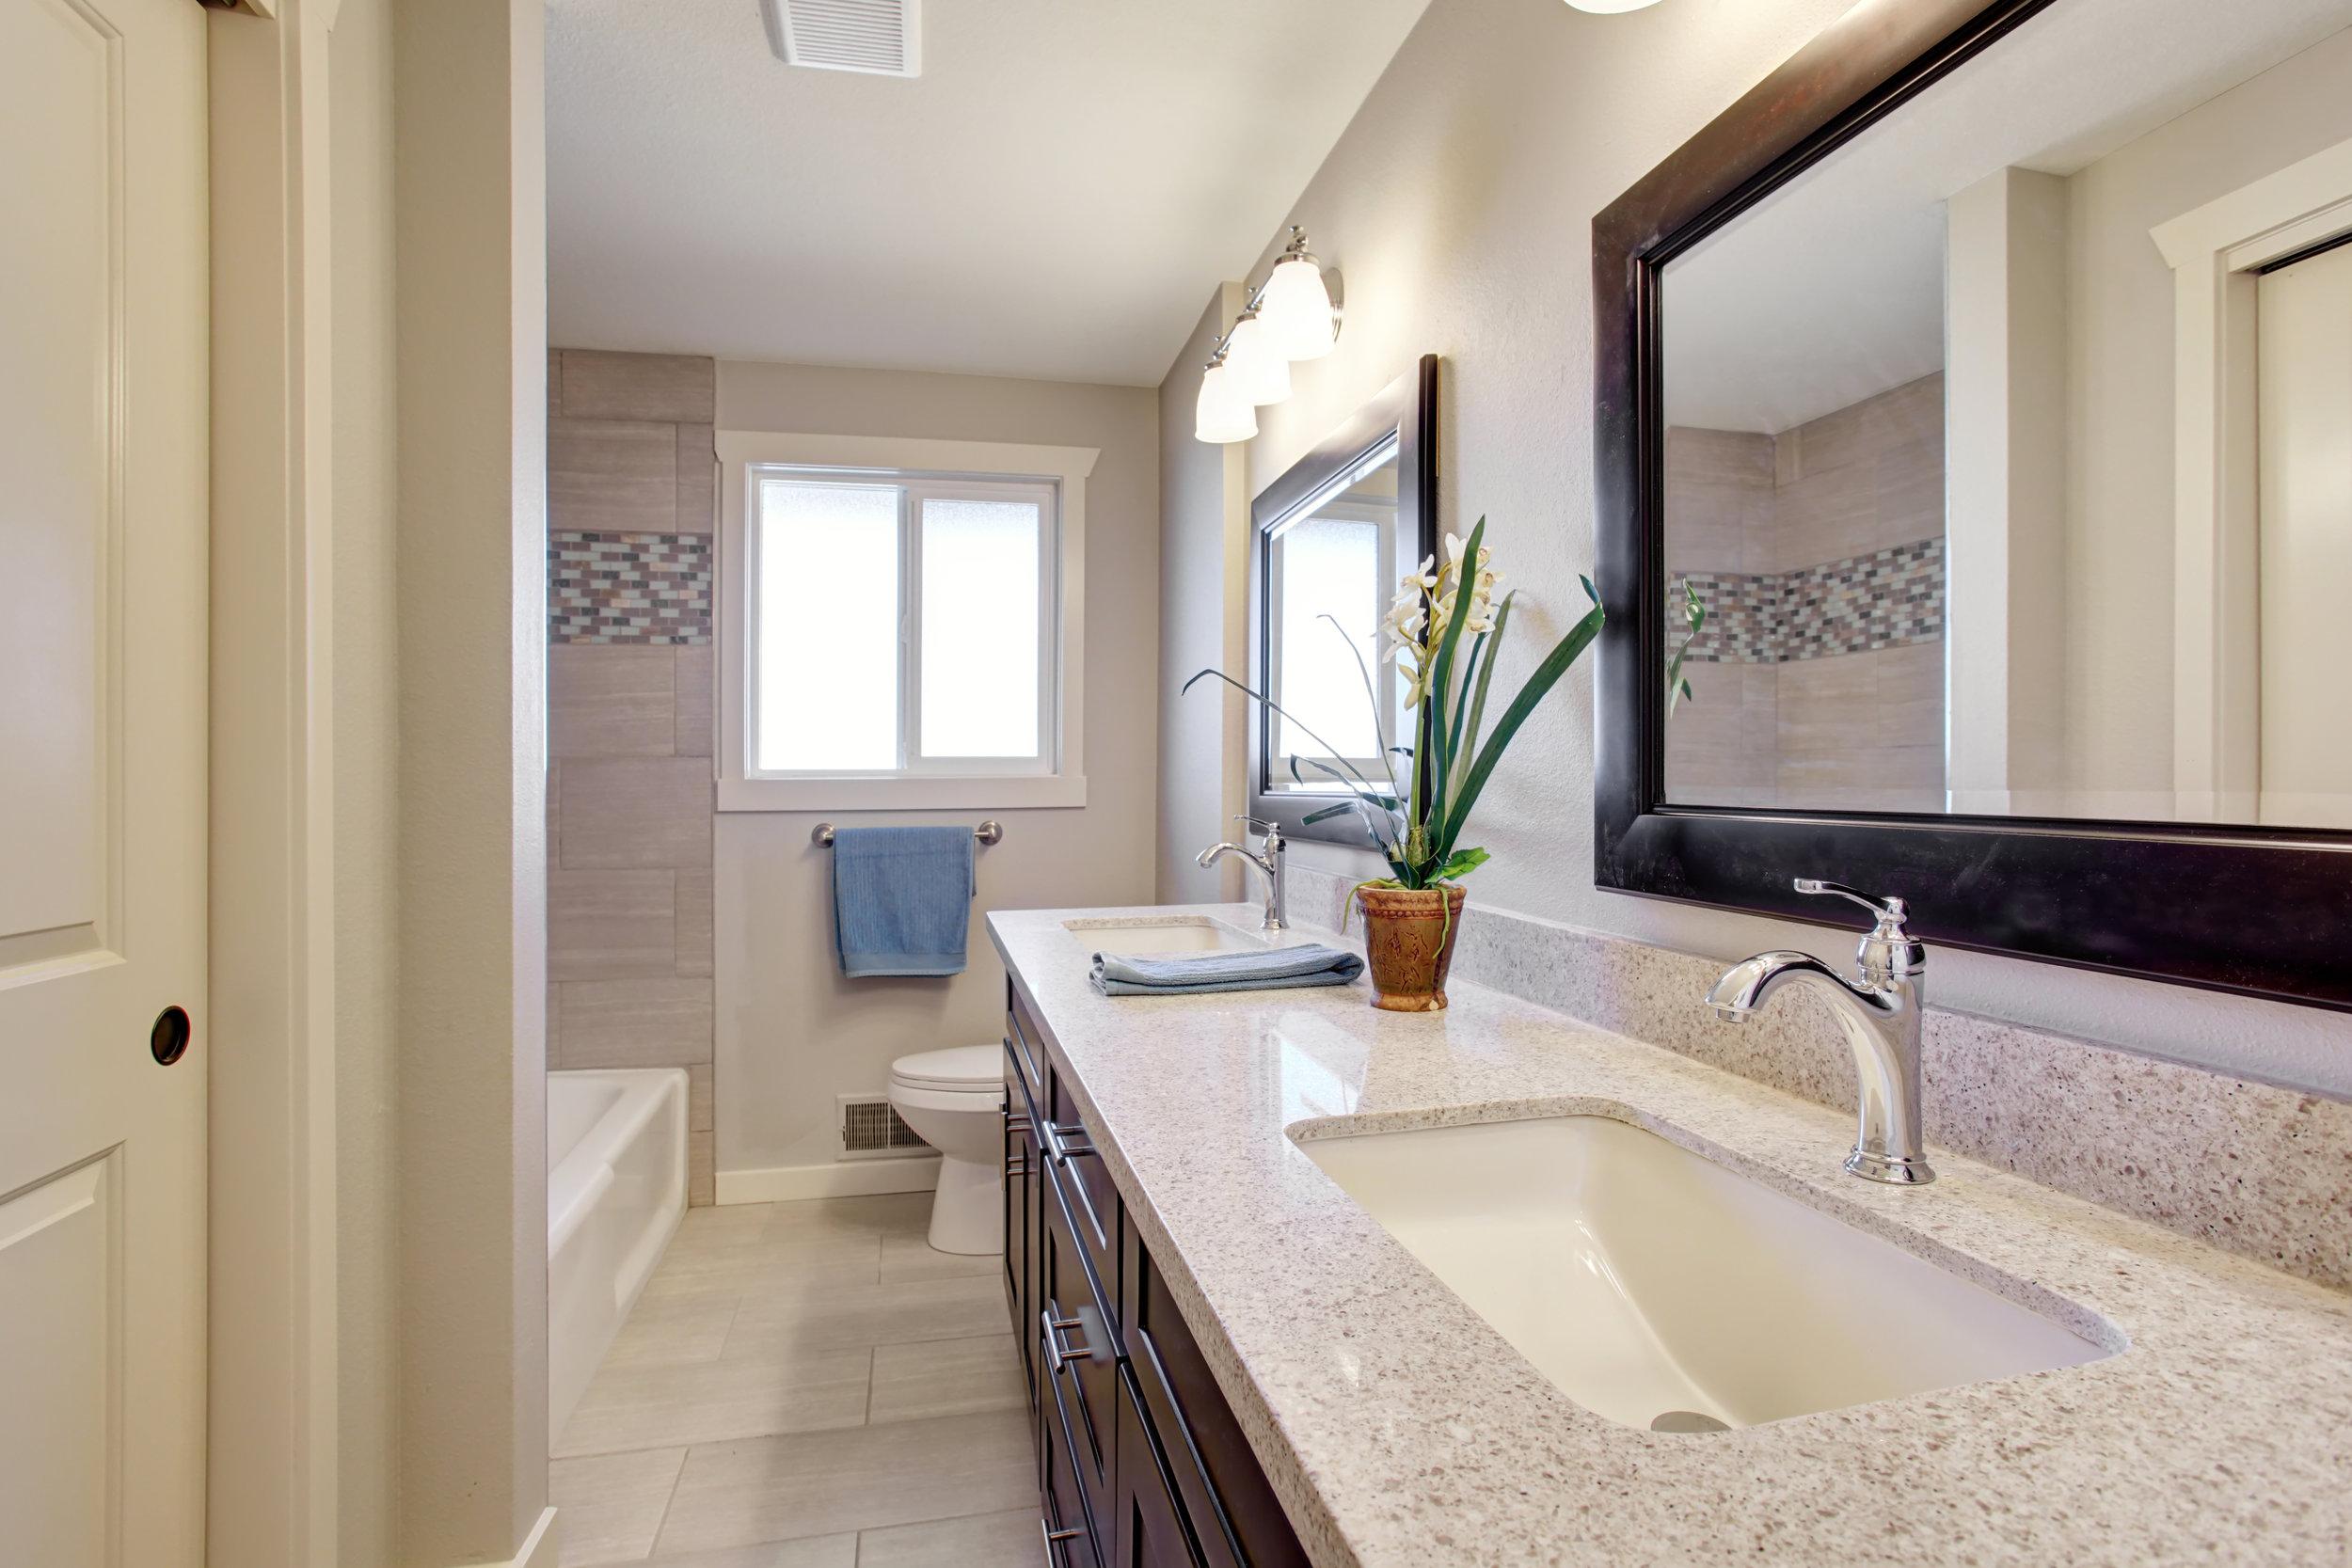 bigstock-Beautiful-Bathroom-With-Tile-F-93777899.jpg